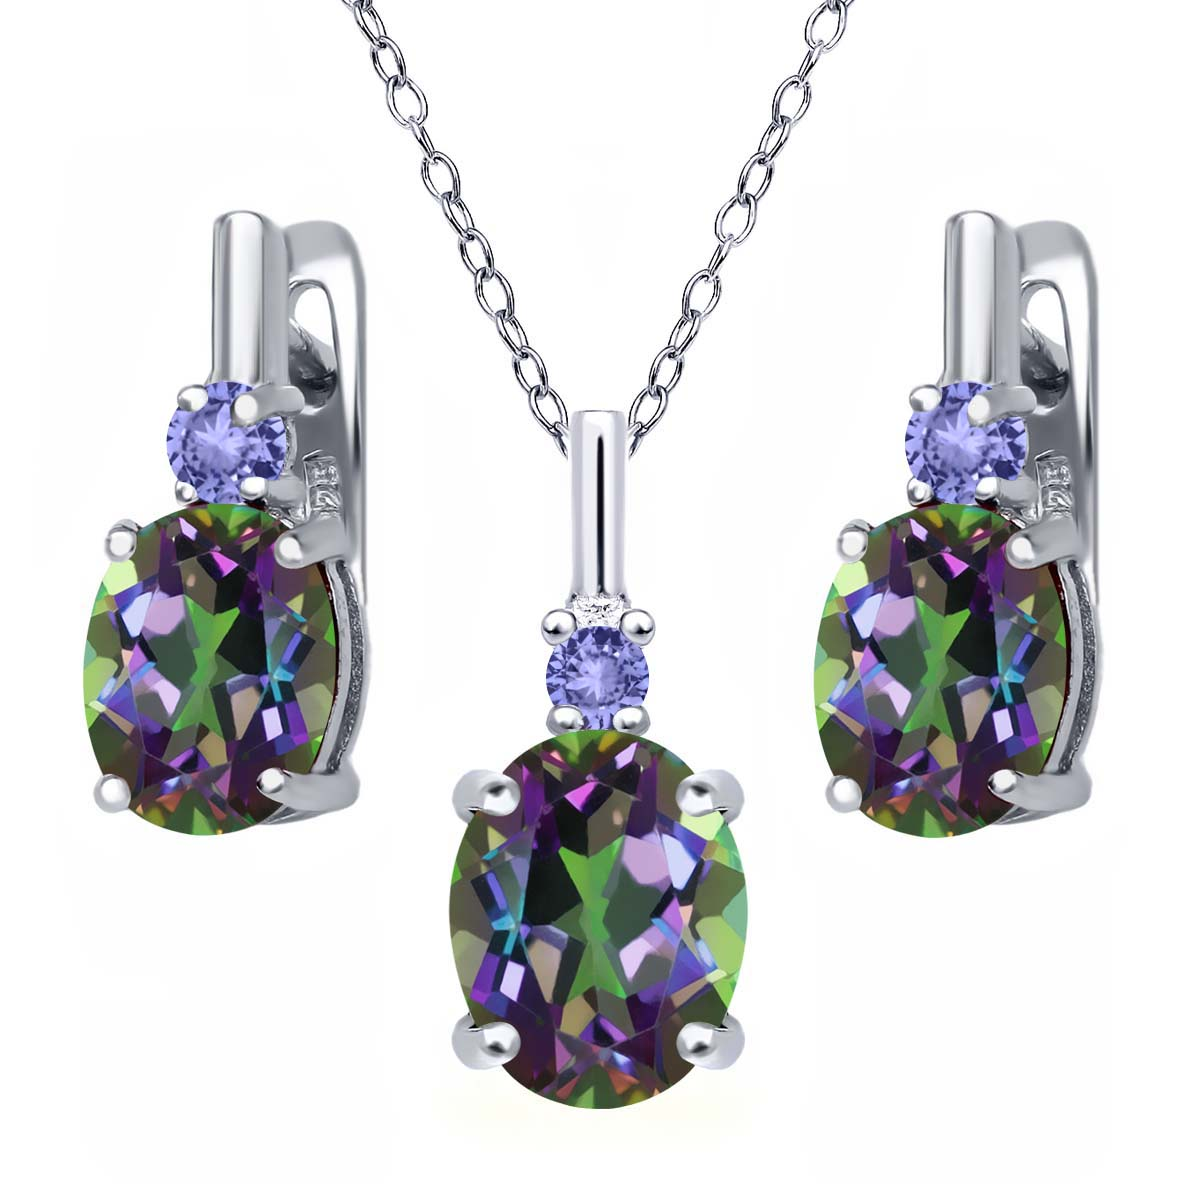 6.98 Ct Green Mystic Topaz Blue Tanzanite 925 Silver Pendant Earrings Set by